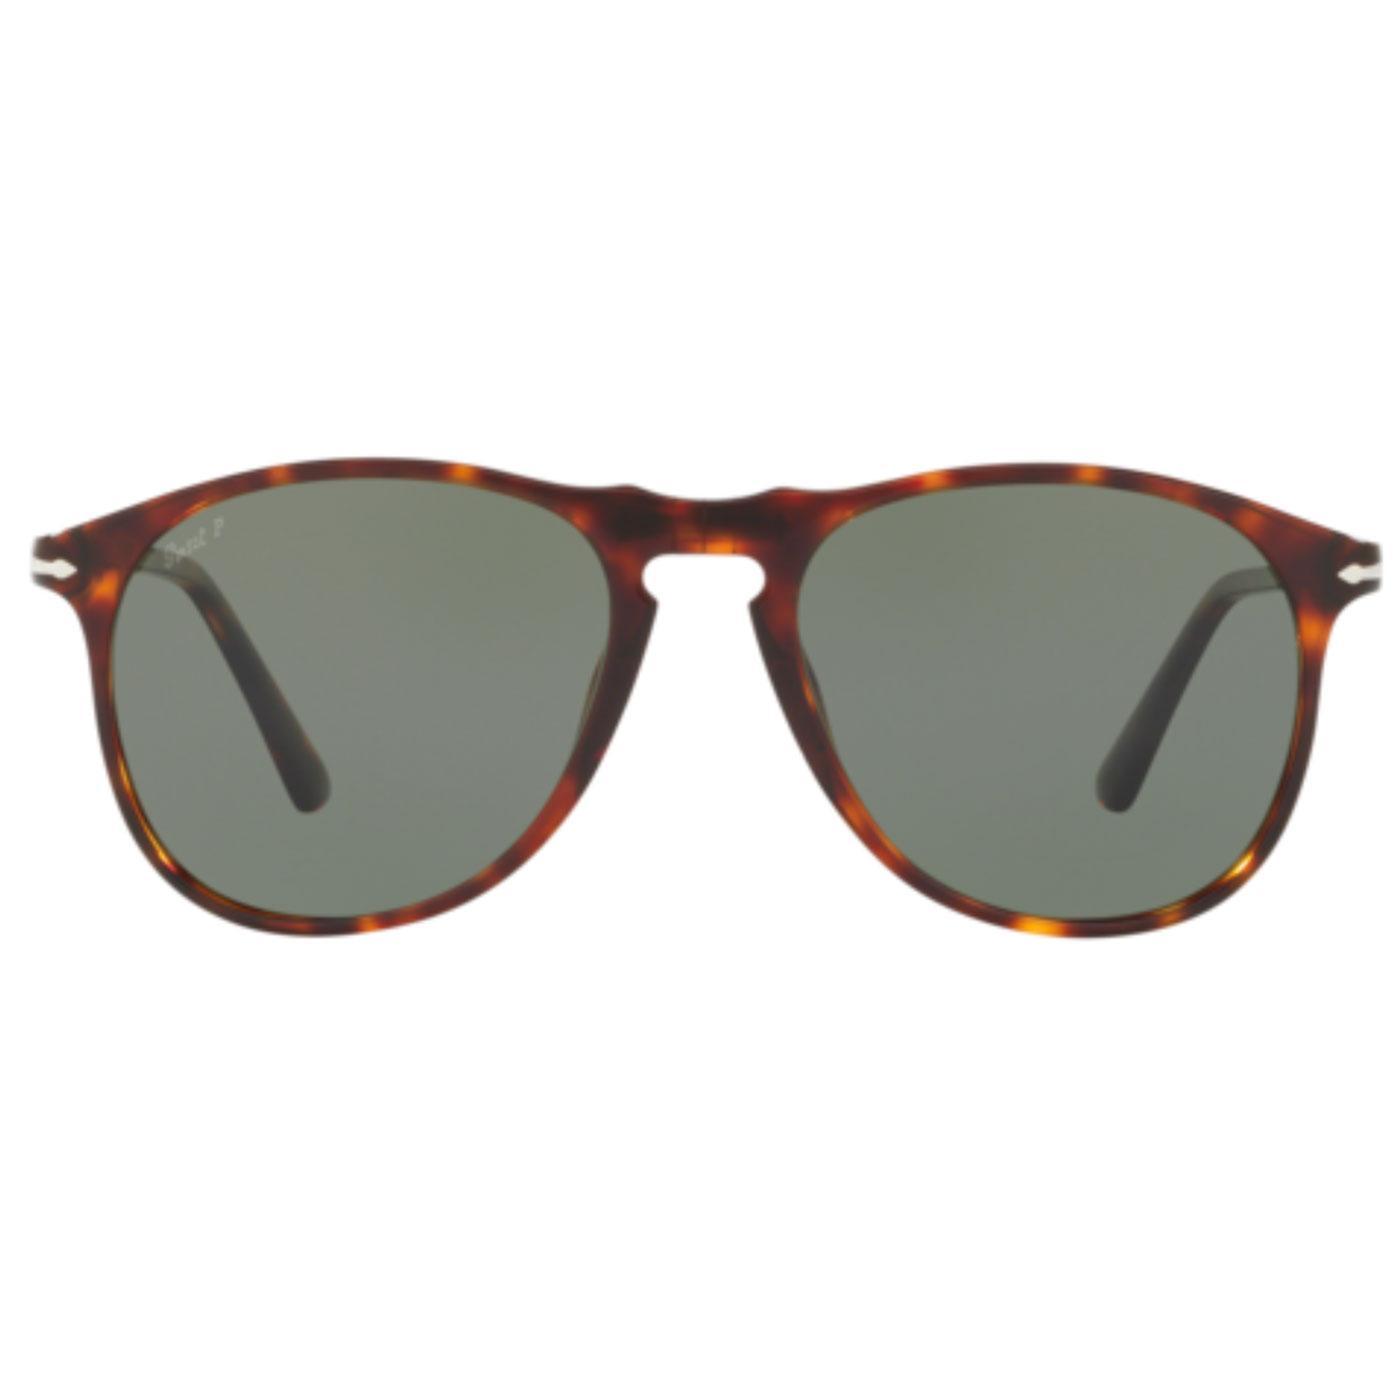 649 Series PERSOL Polarised Sunglasses (Havana)